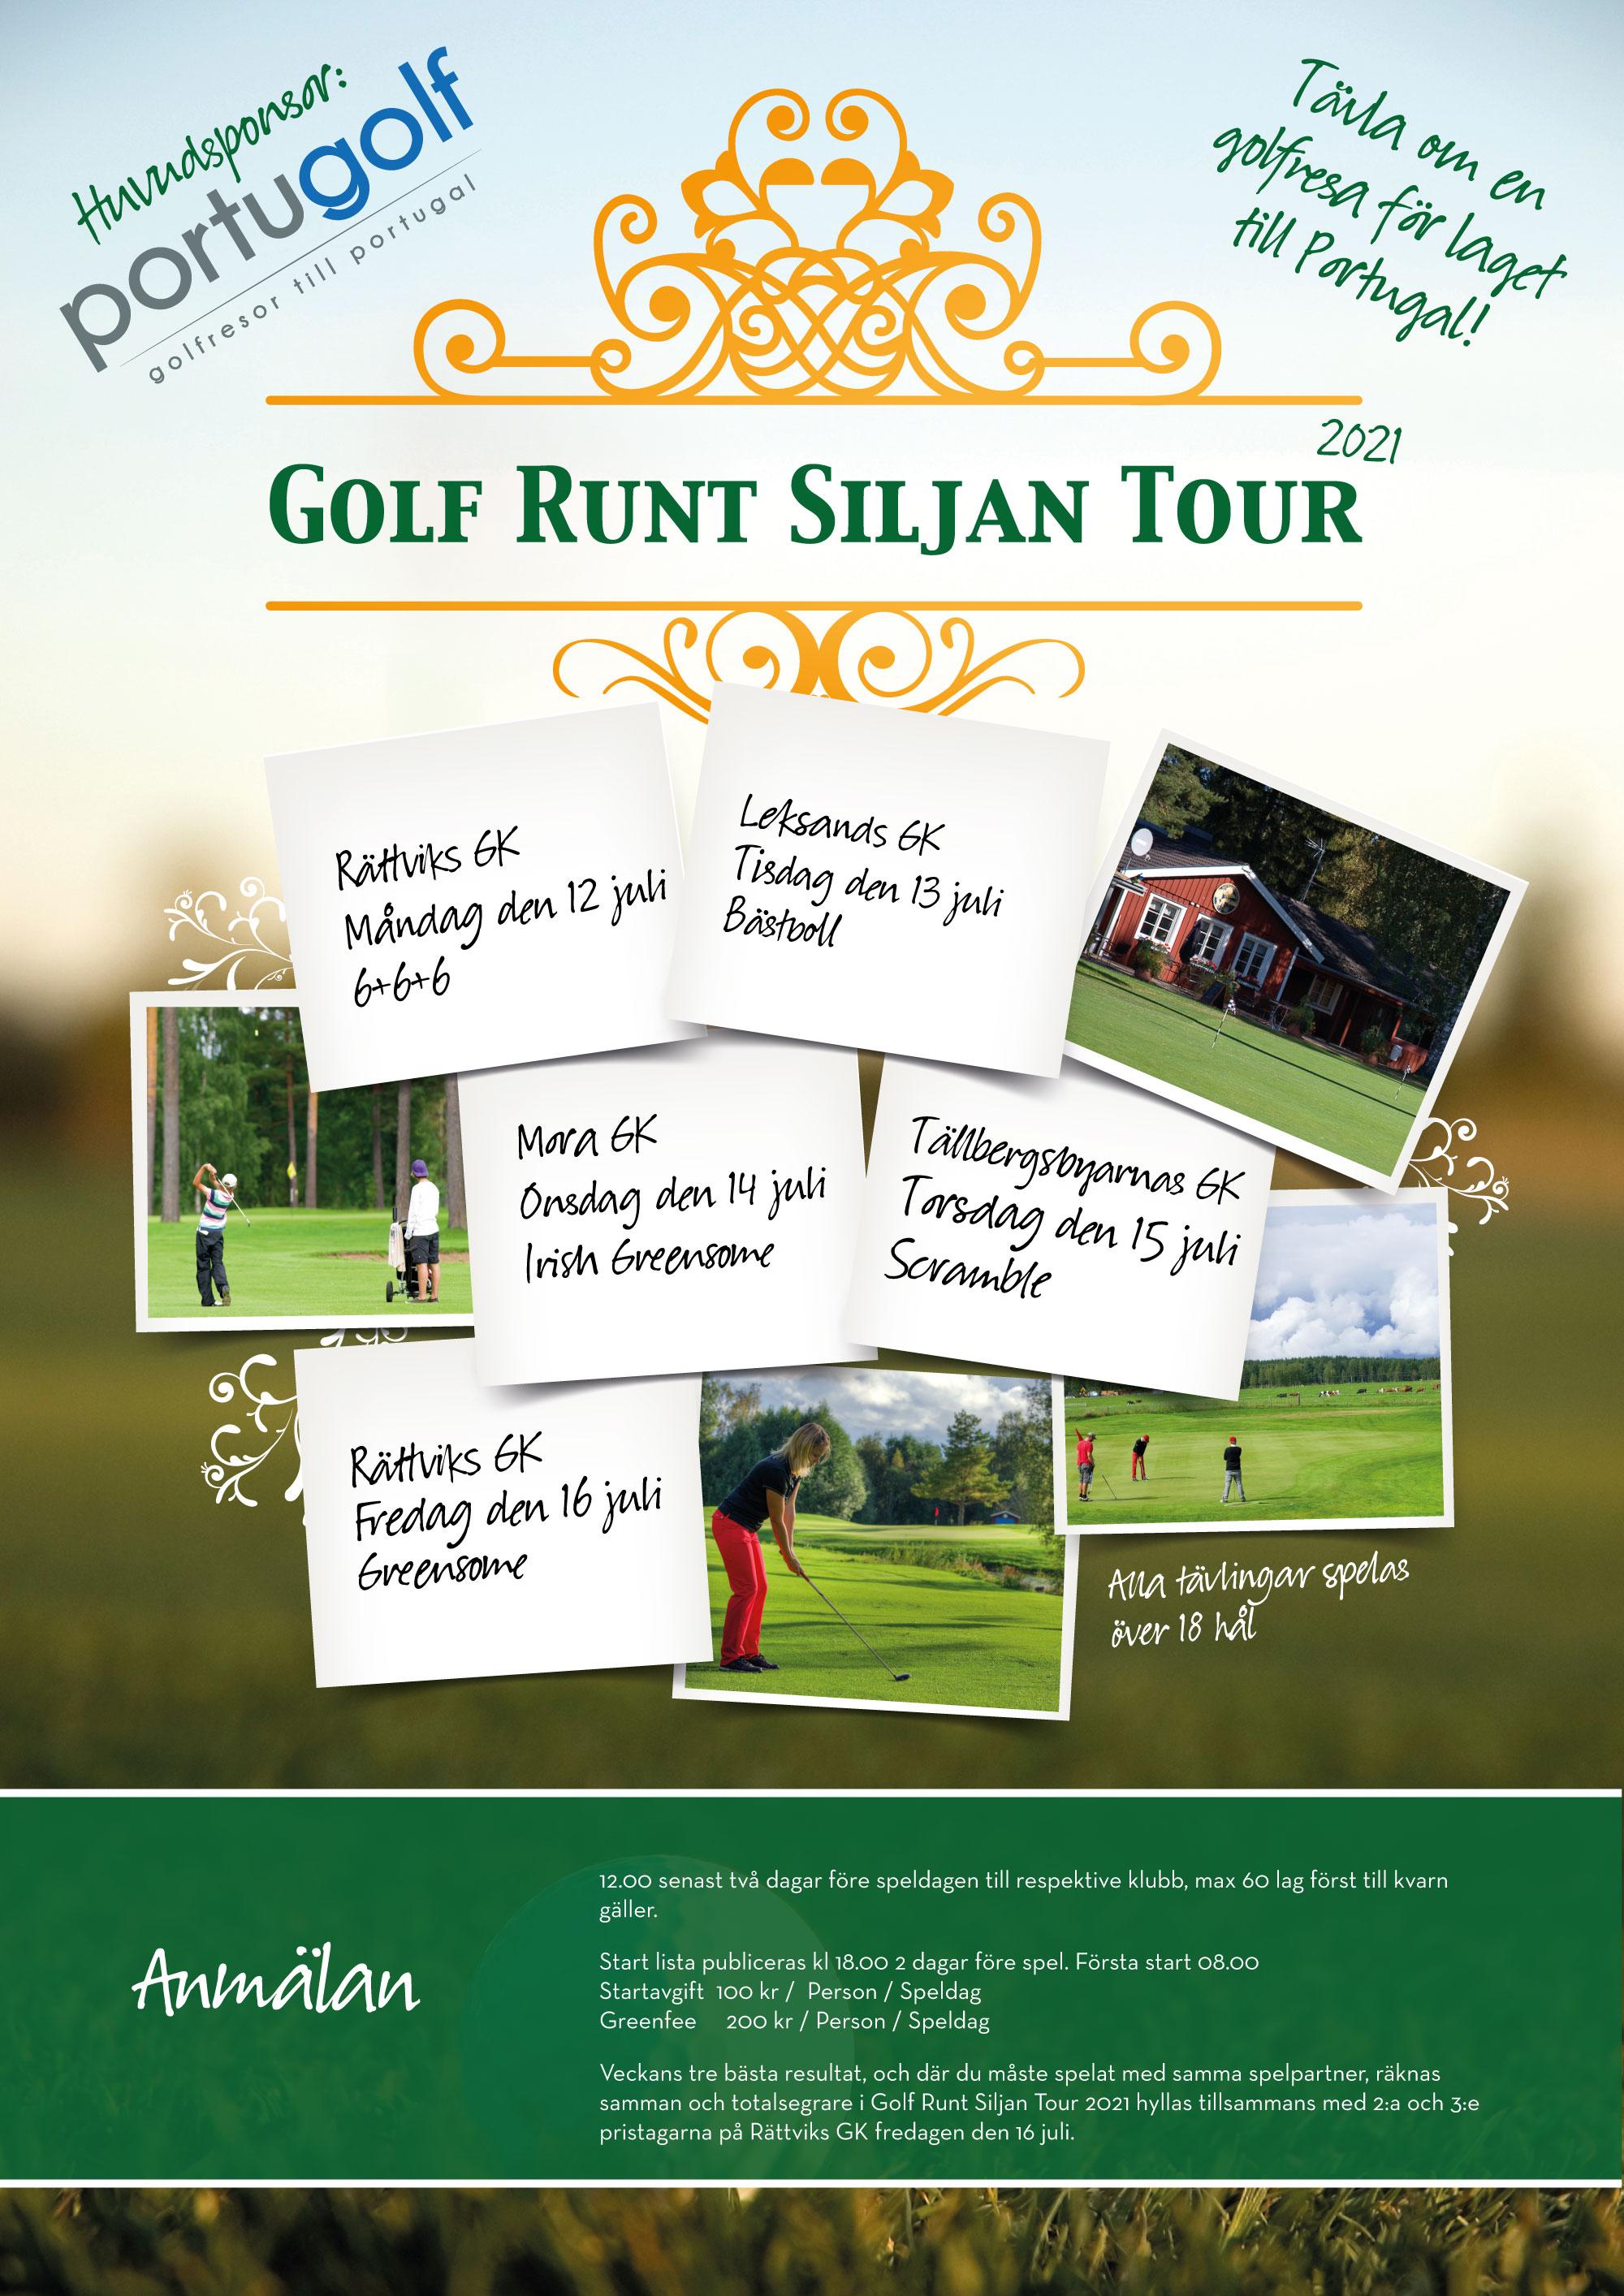 GolfRuntSiljan_2021 (1)